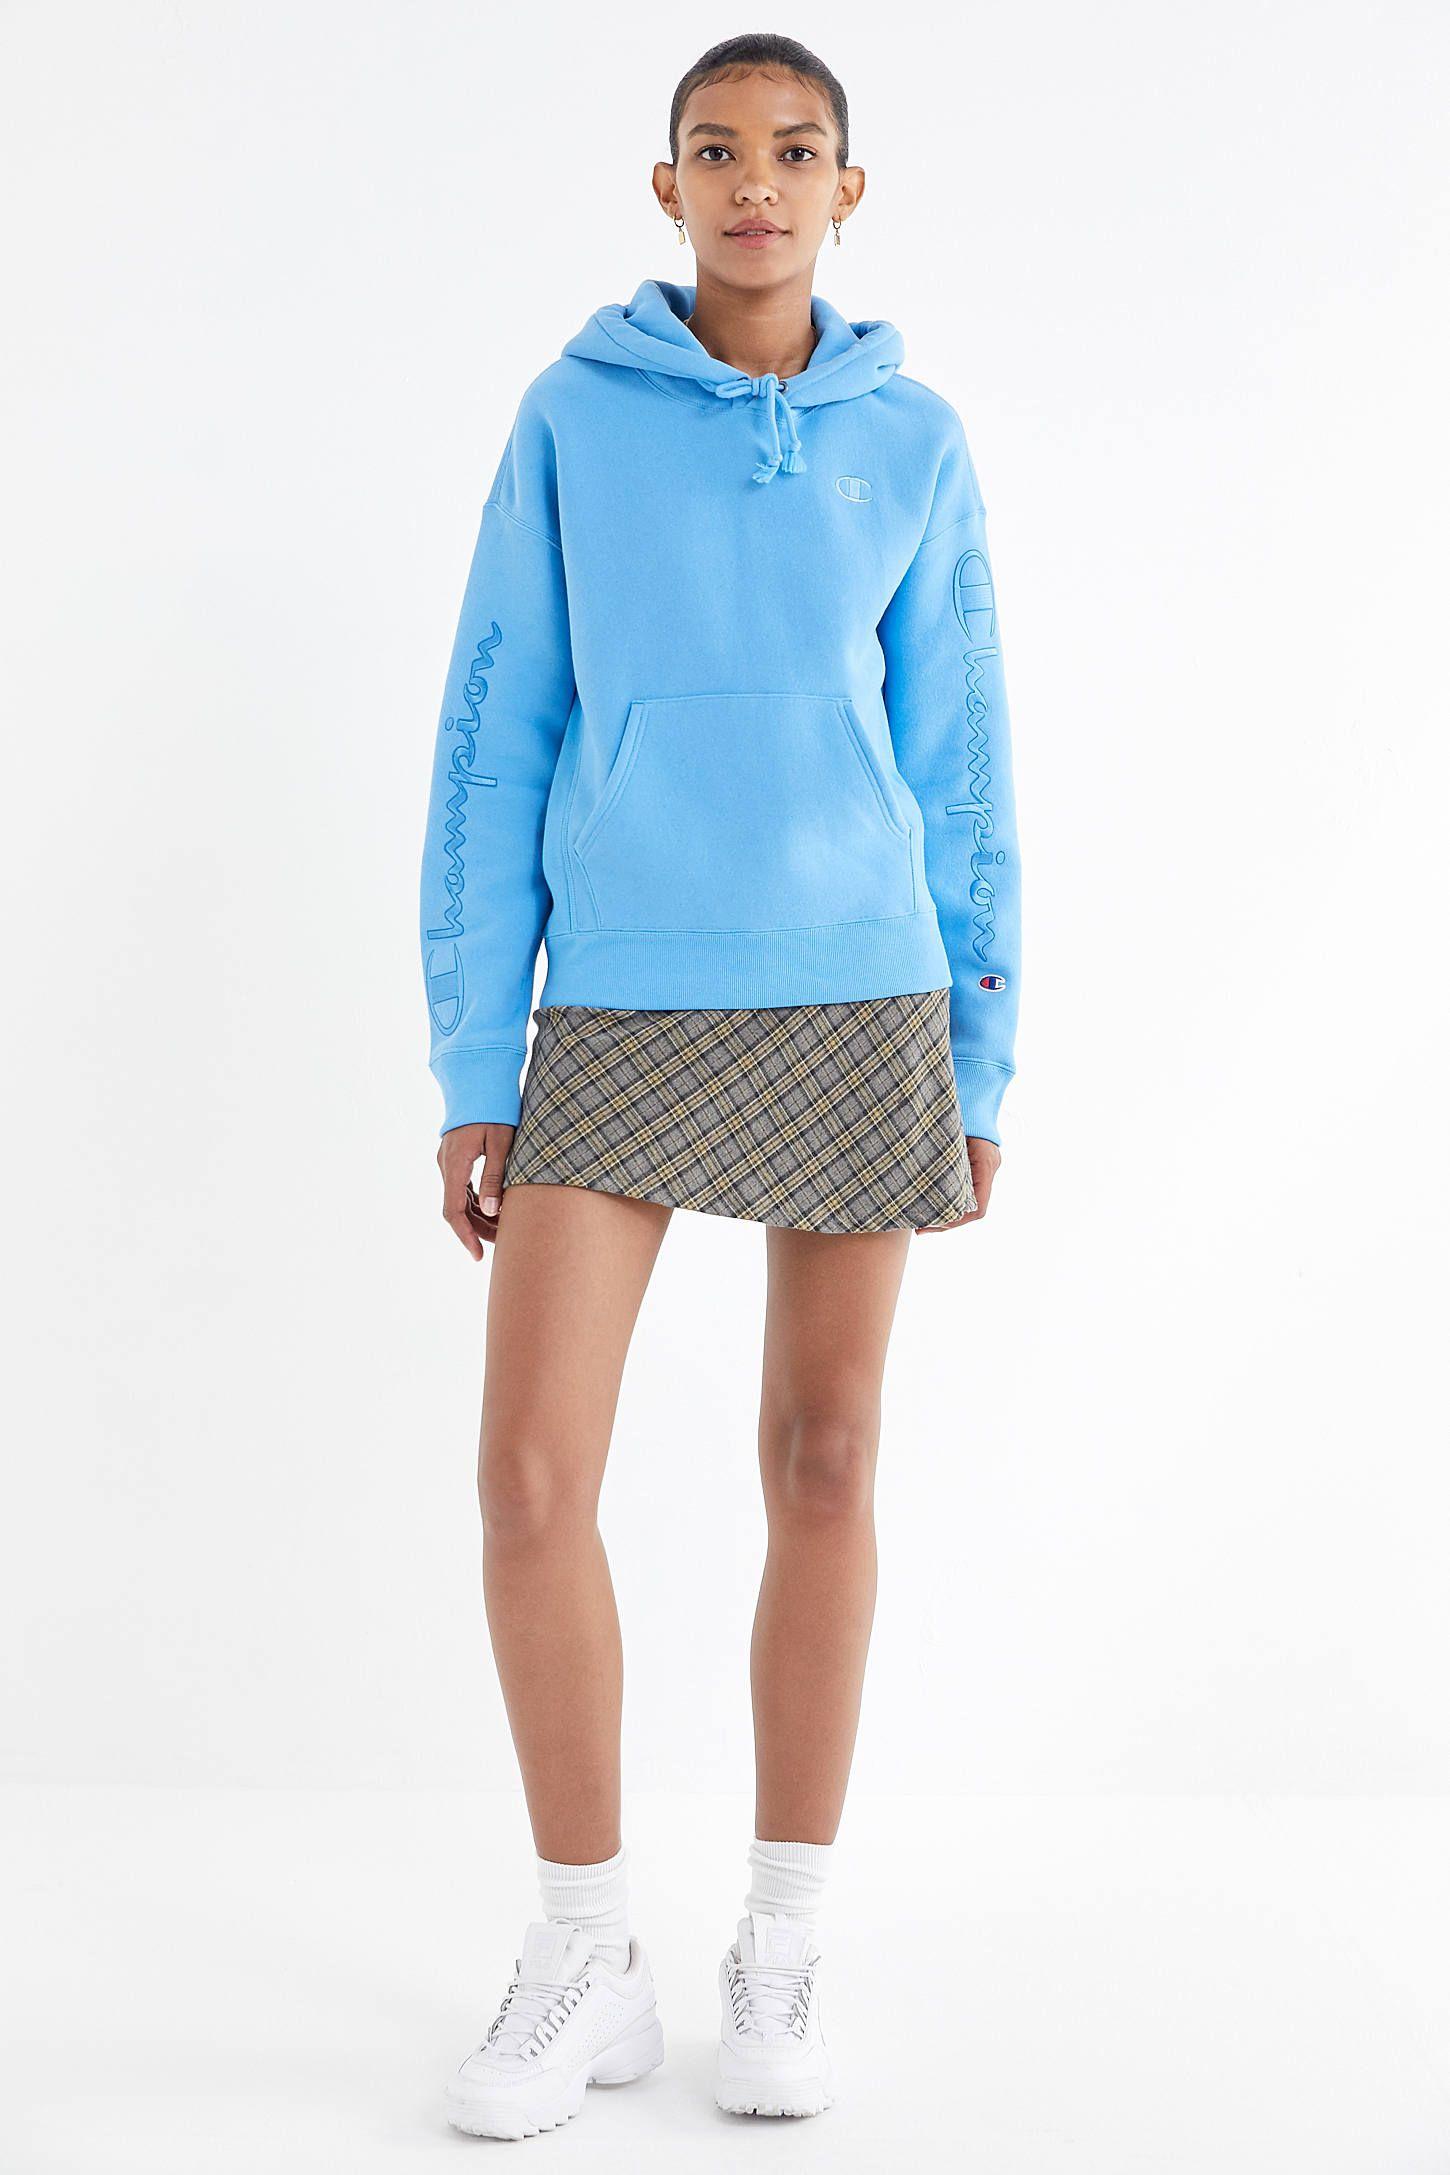 Champion Uo Satin Script Hoodie Sweatshirt Sweatshirts Hoodie Sweatshirts Cotton Hoodie [ 2175 x 1450 Pixel ]